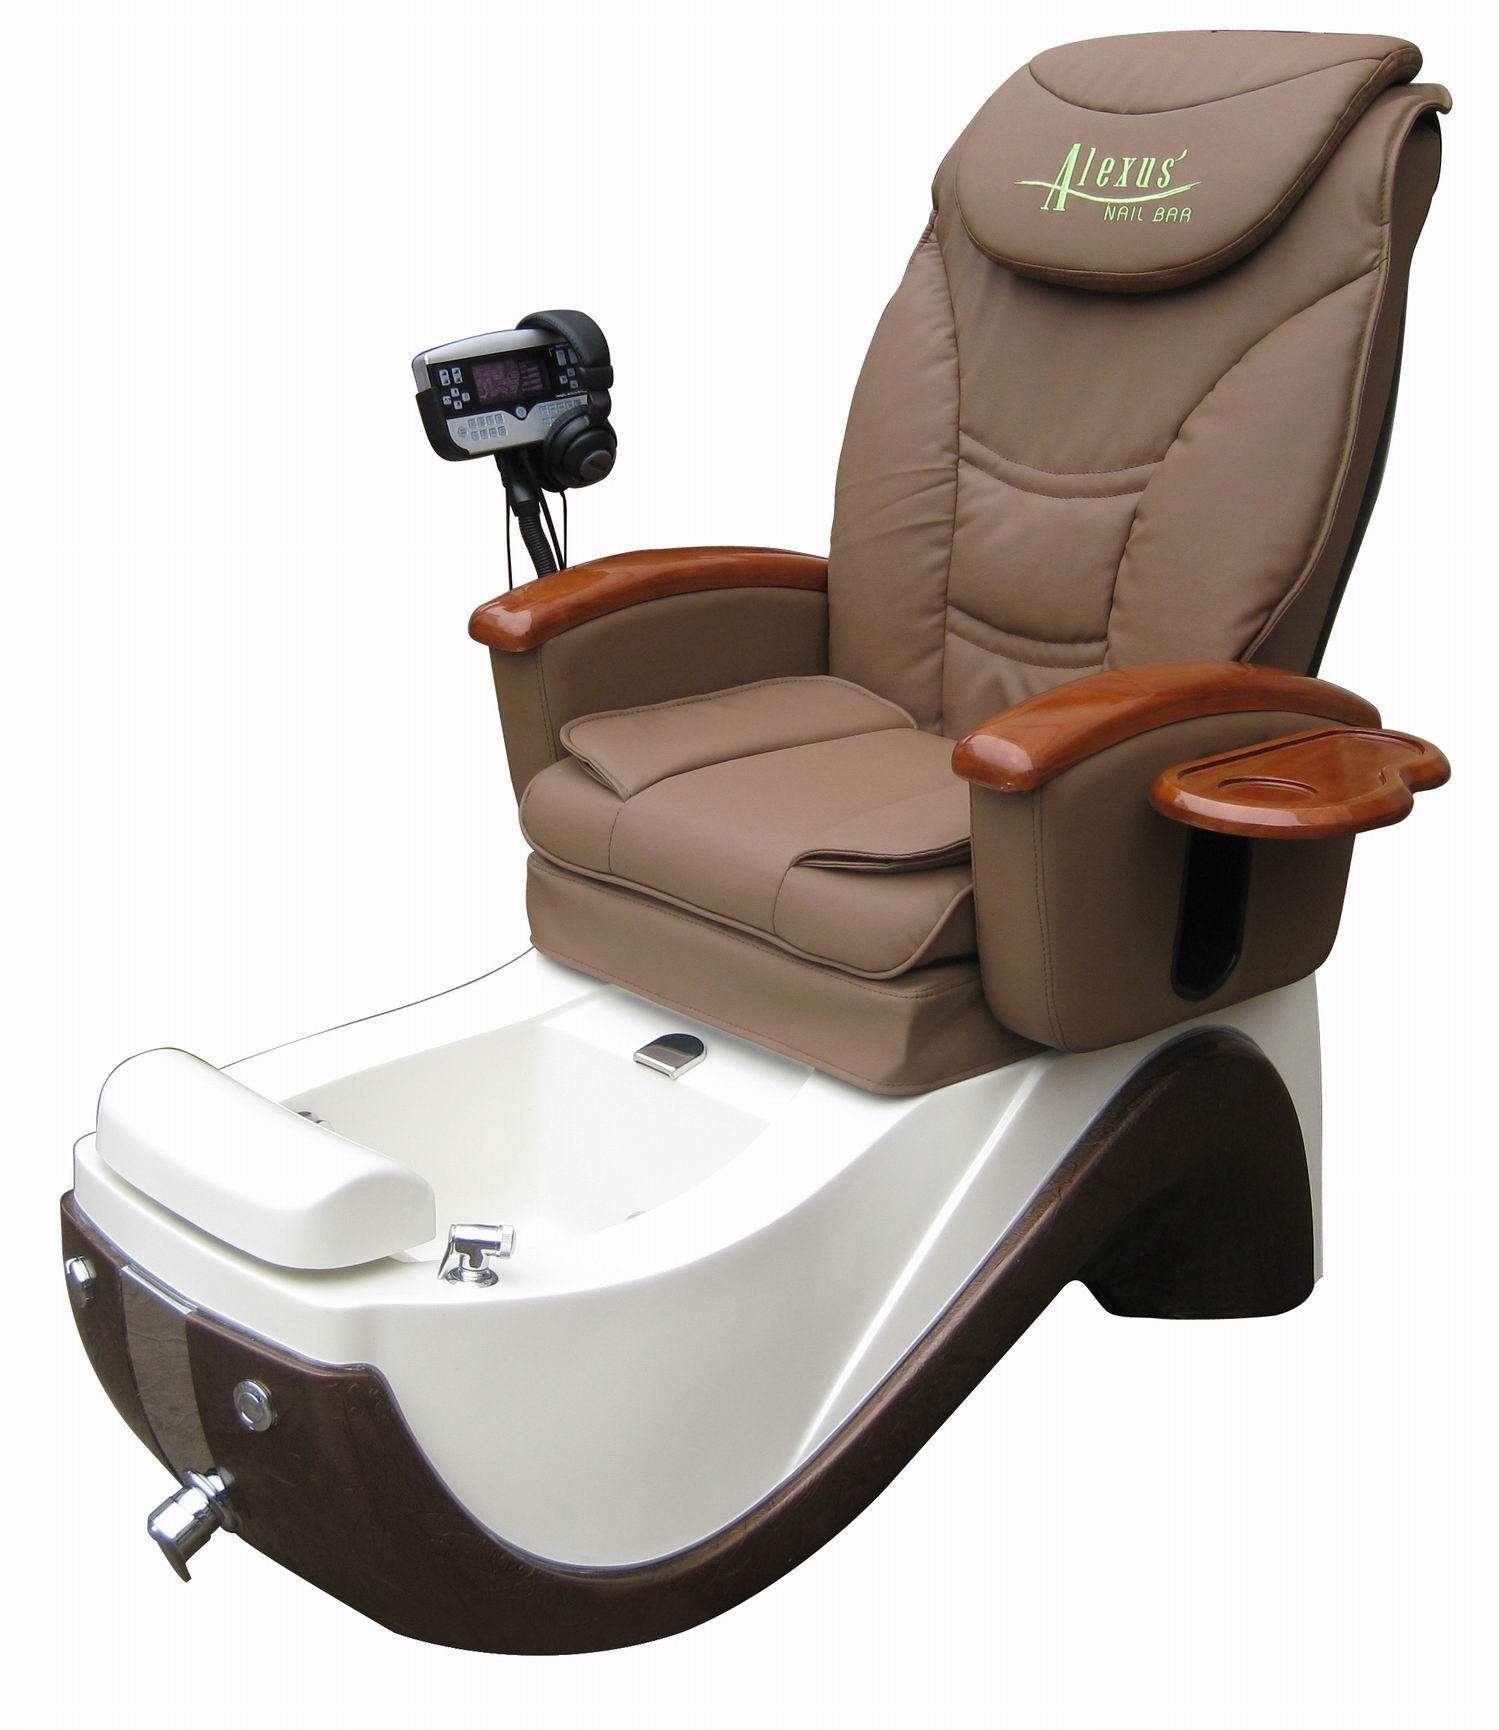 Luxury spa pedicure chair